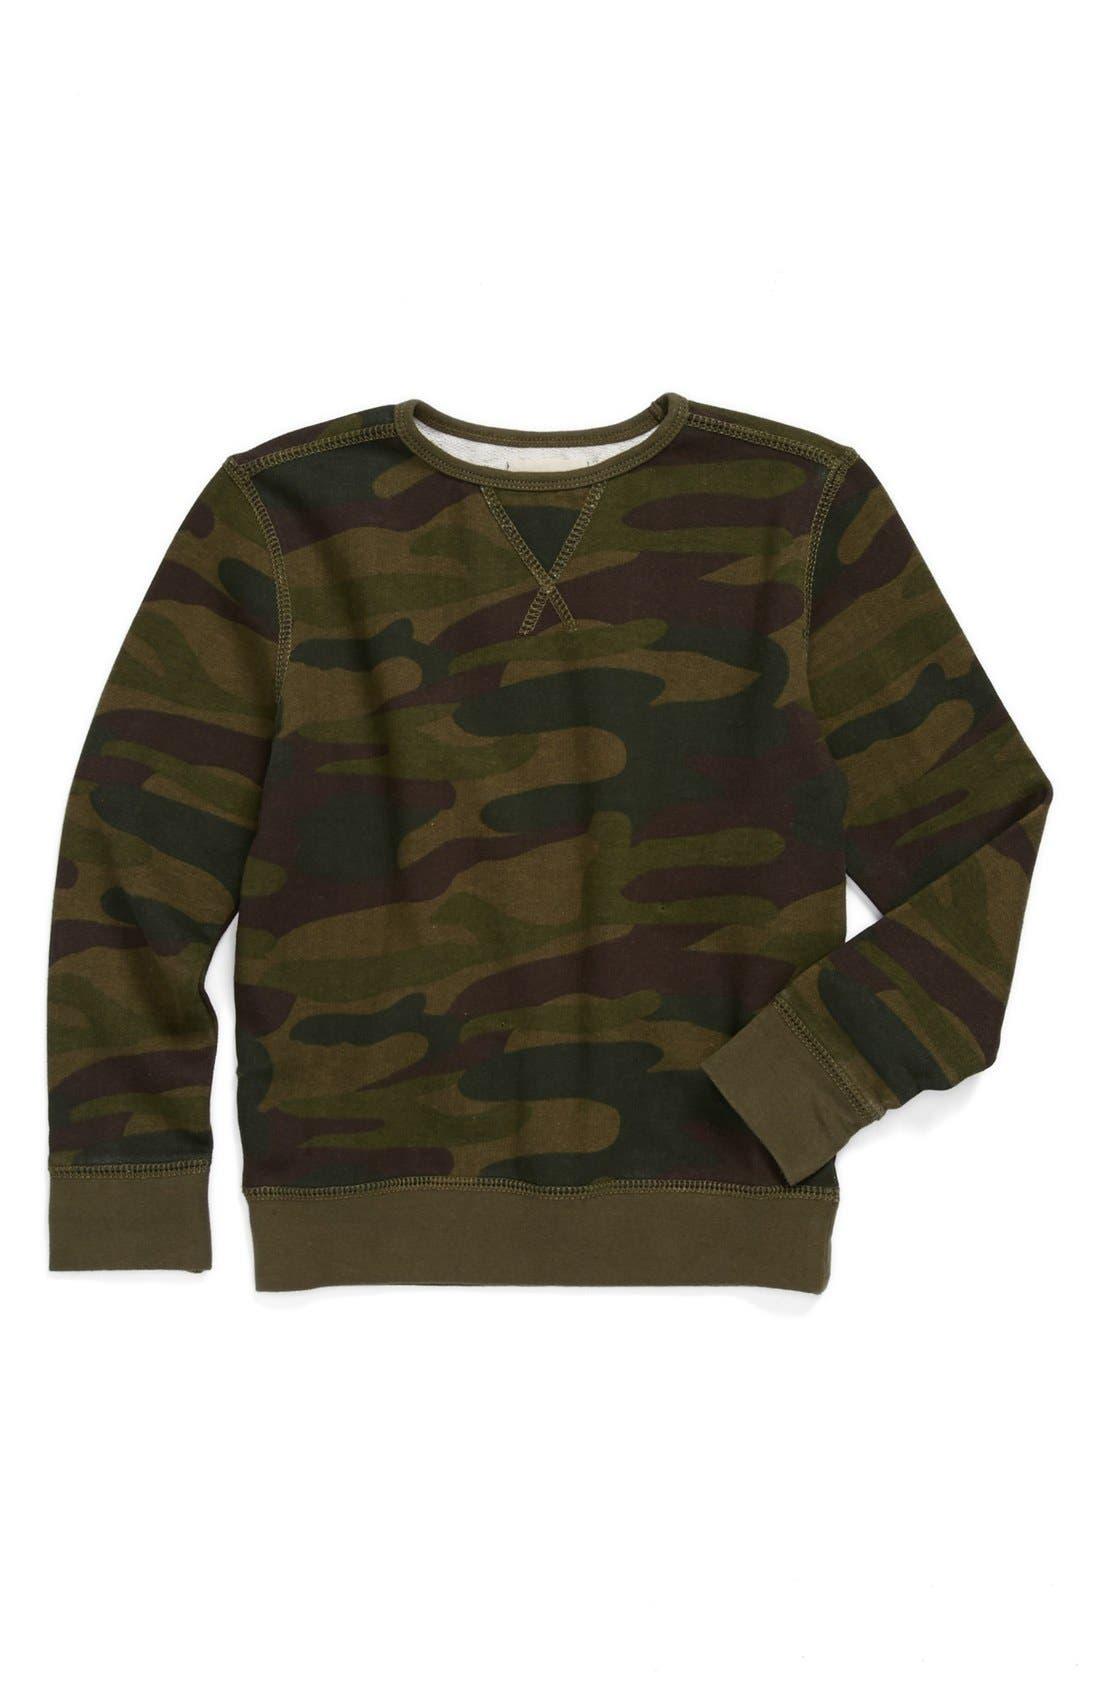 Main Image - Peek 'Camo' Sweatshirt (Baby Boys)